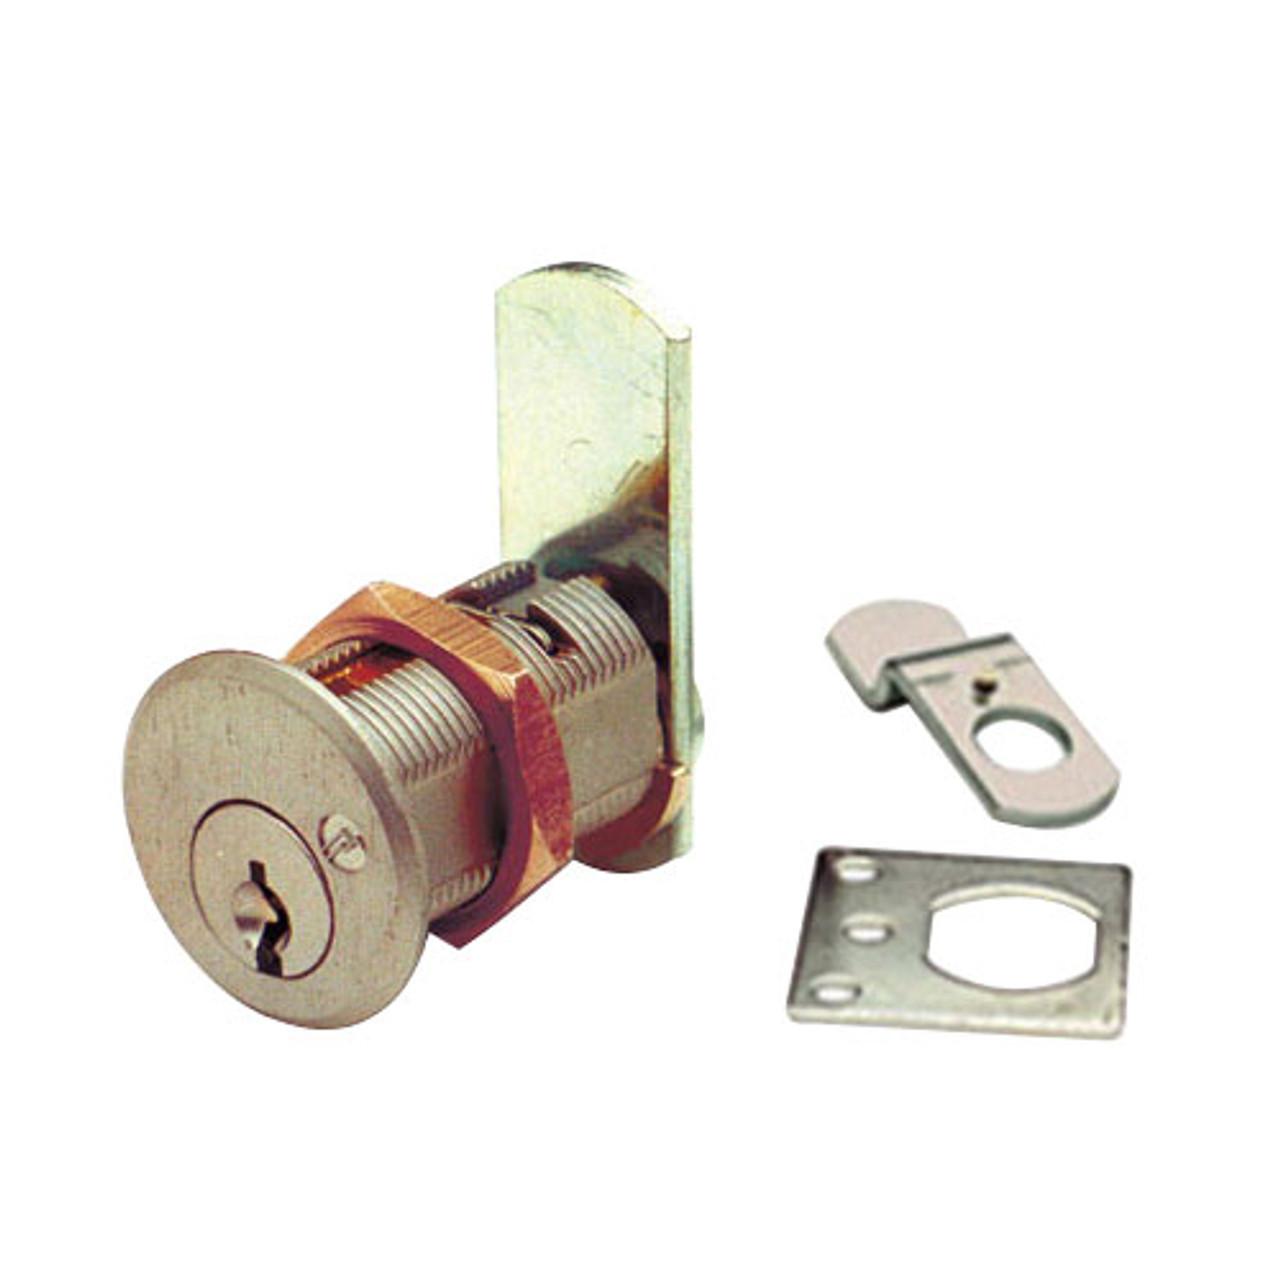 Olympus DCN1-KD-US3 Cam Locks in Bright Brass Finish